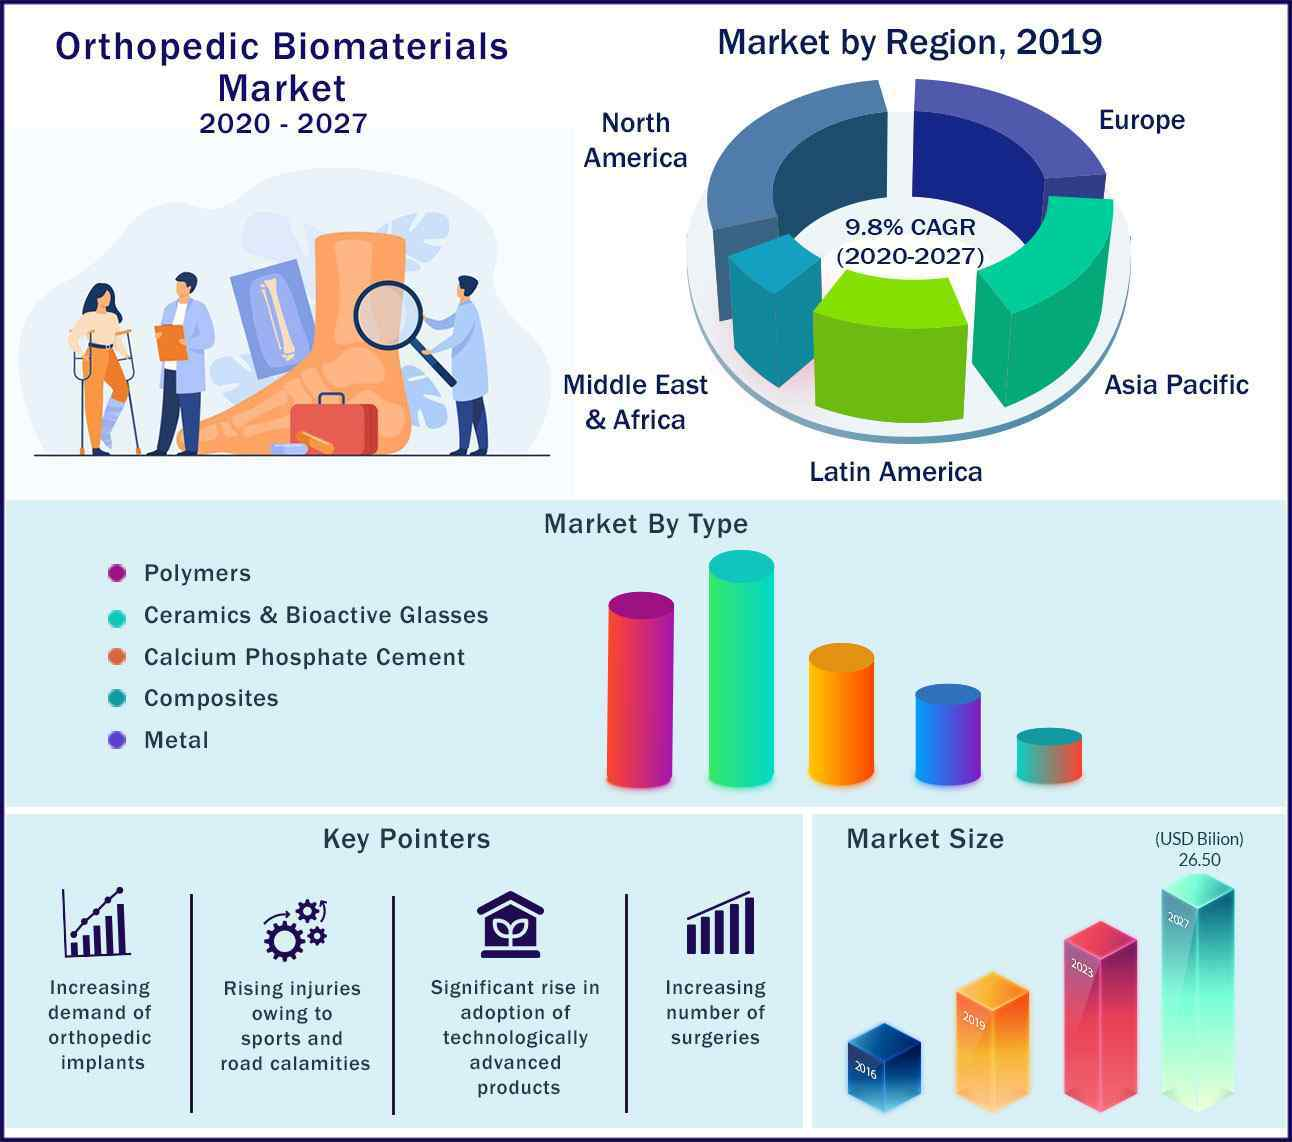 Global Orthopedic Biomaterials Market 2020 to 2027